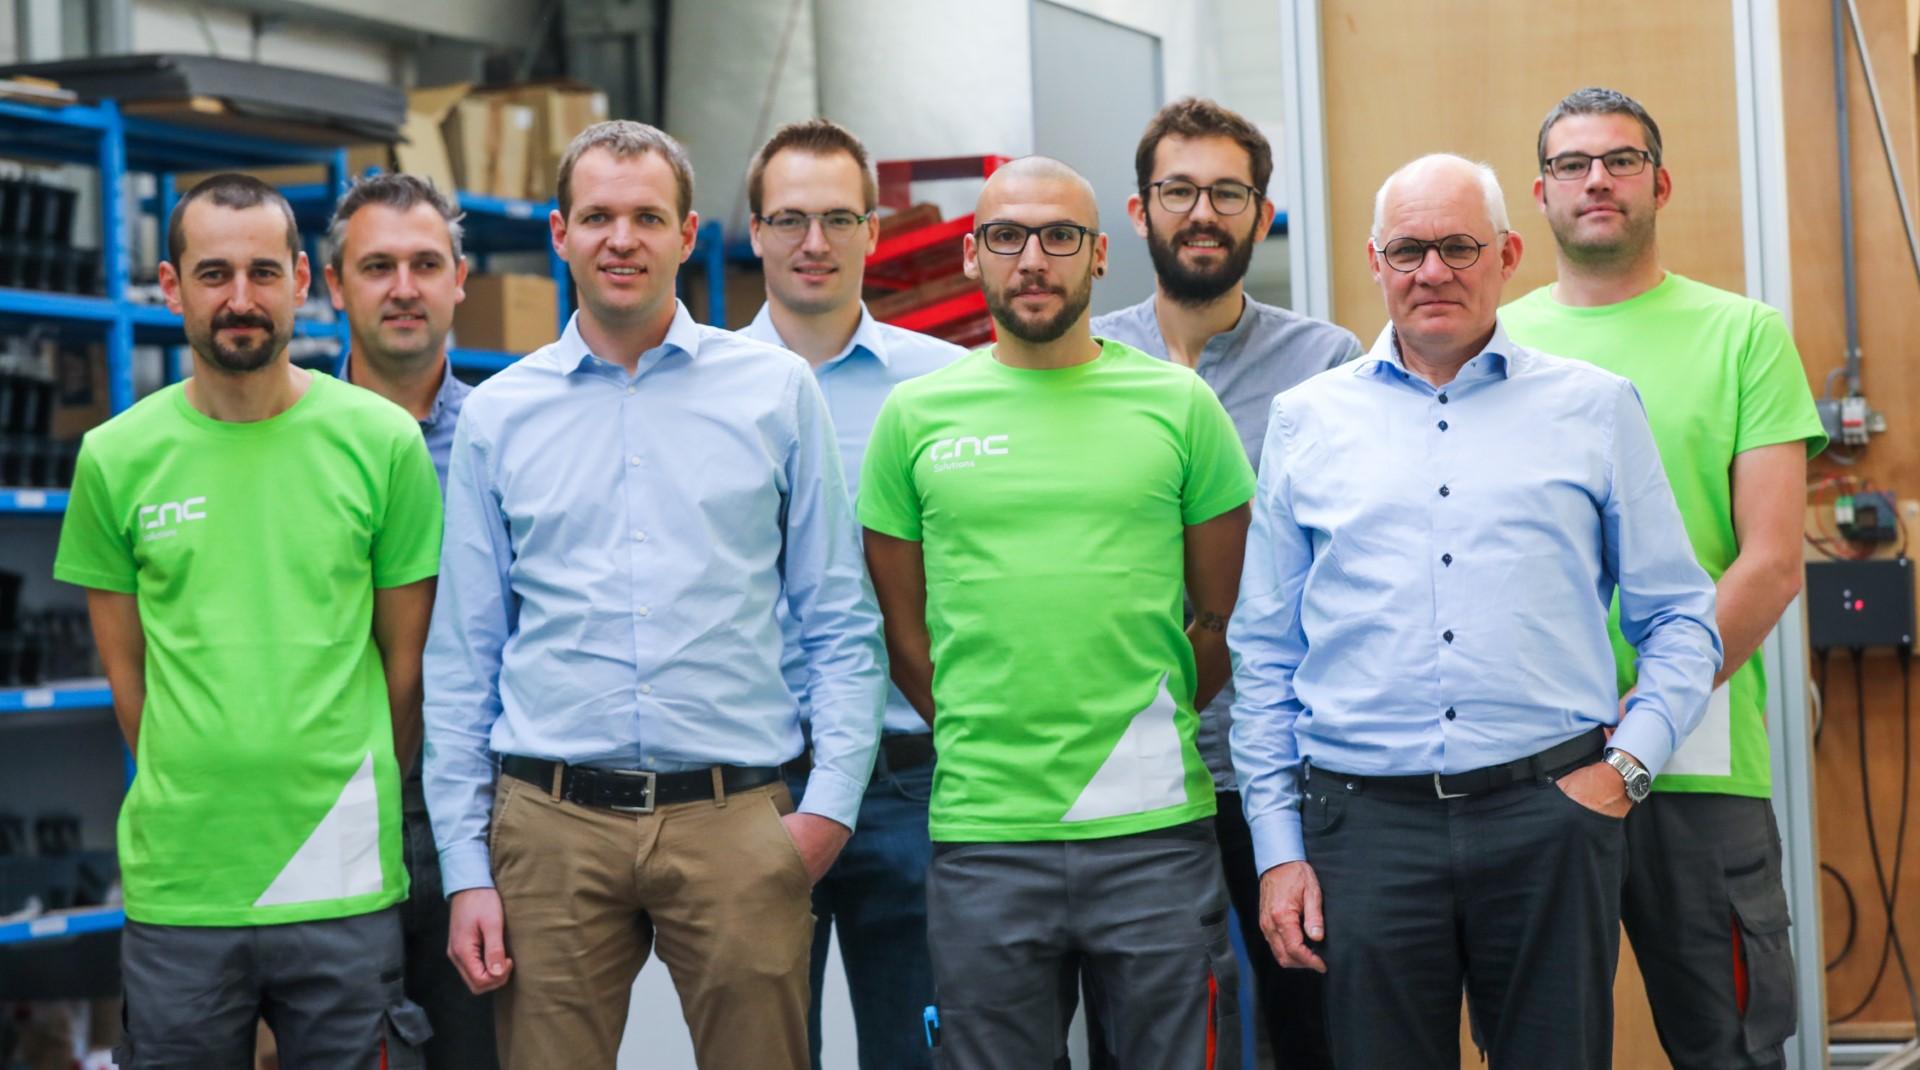 cnc solutions team